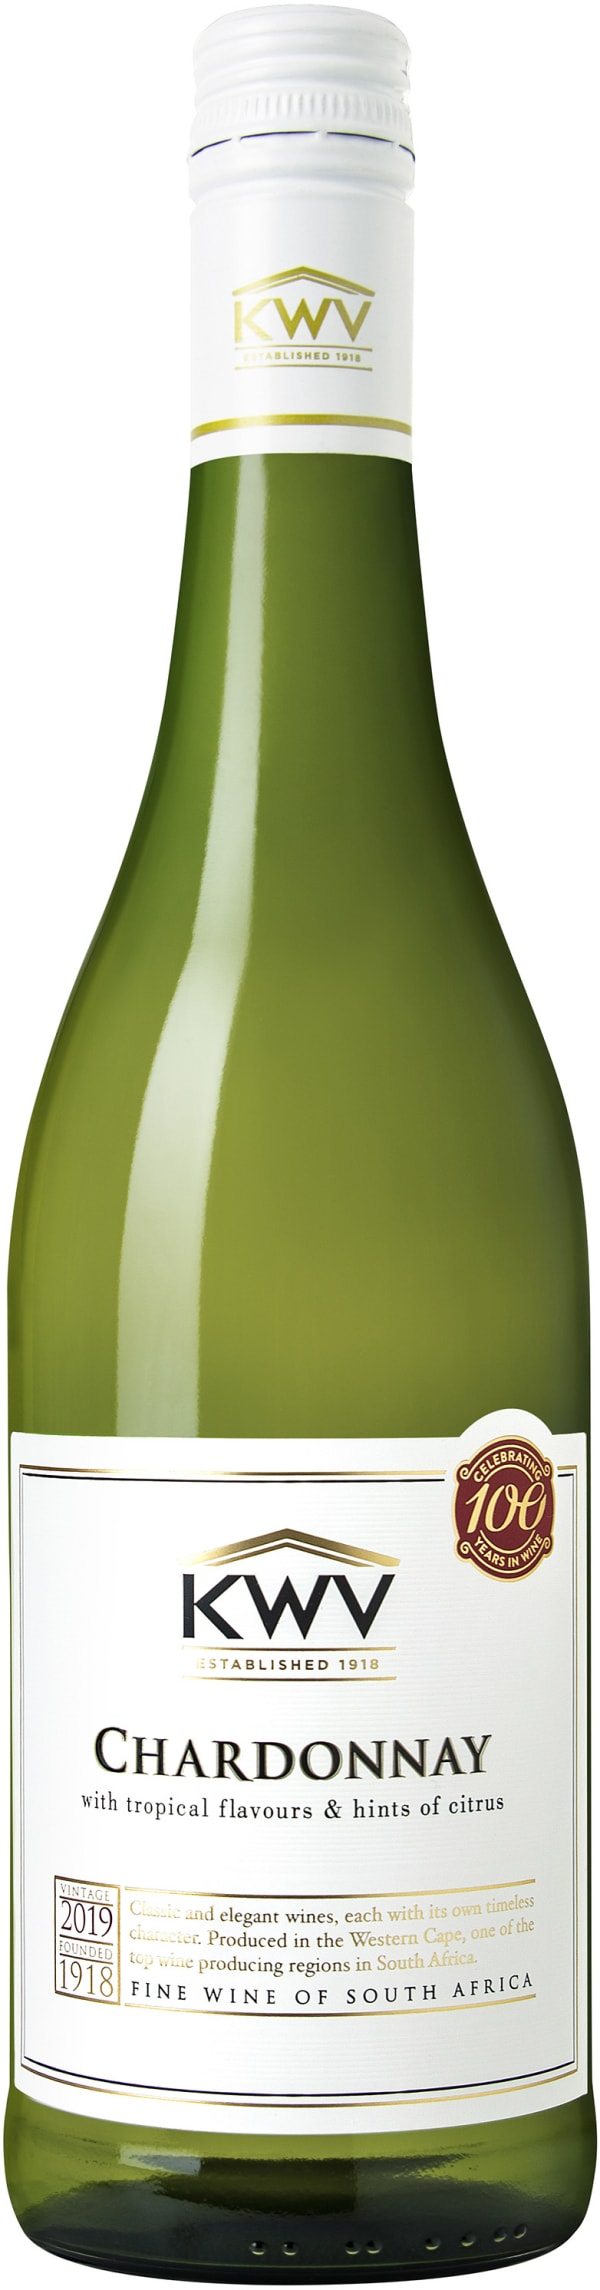 KWV Classic Collection Chardonnay 2019